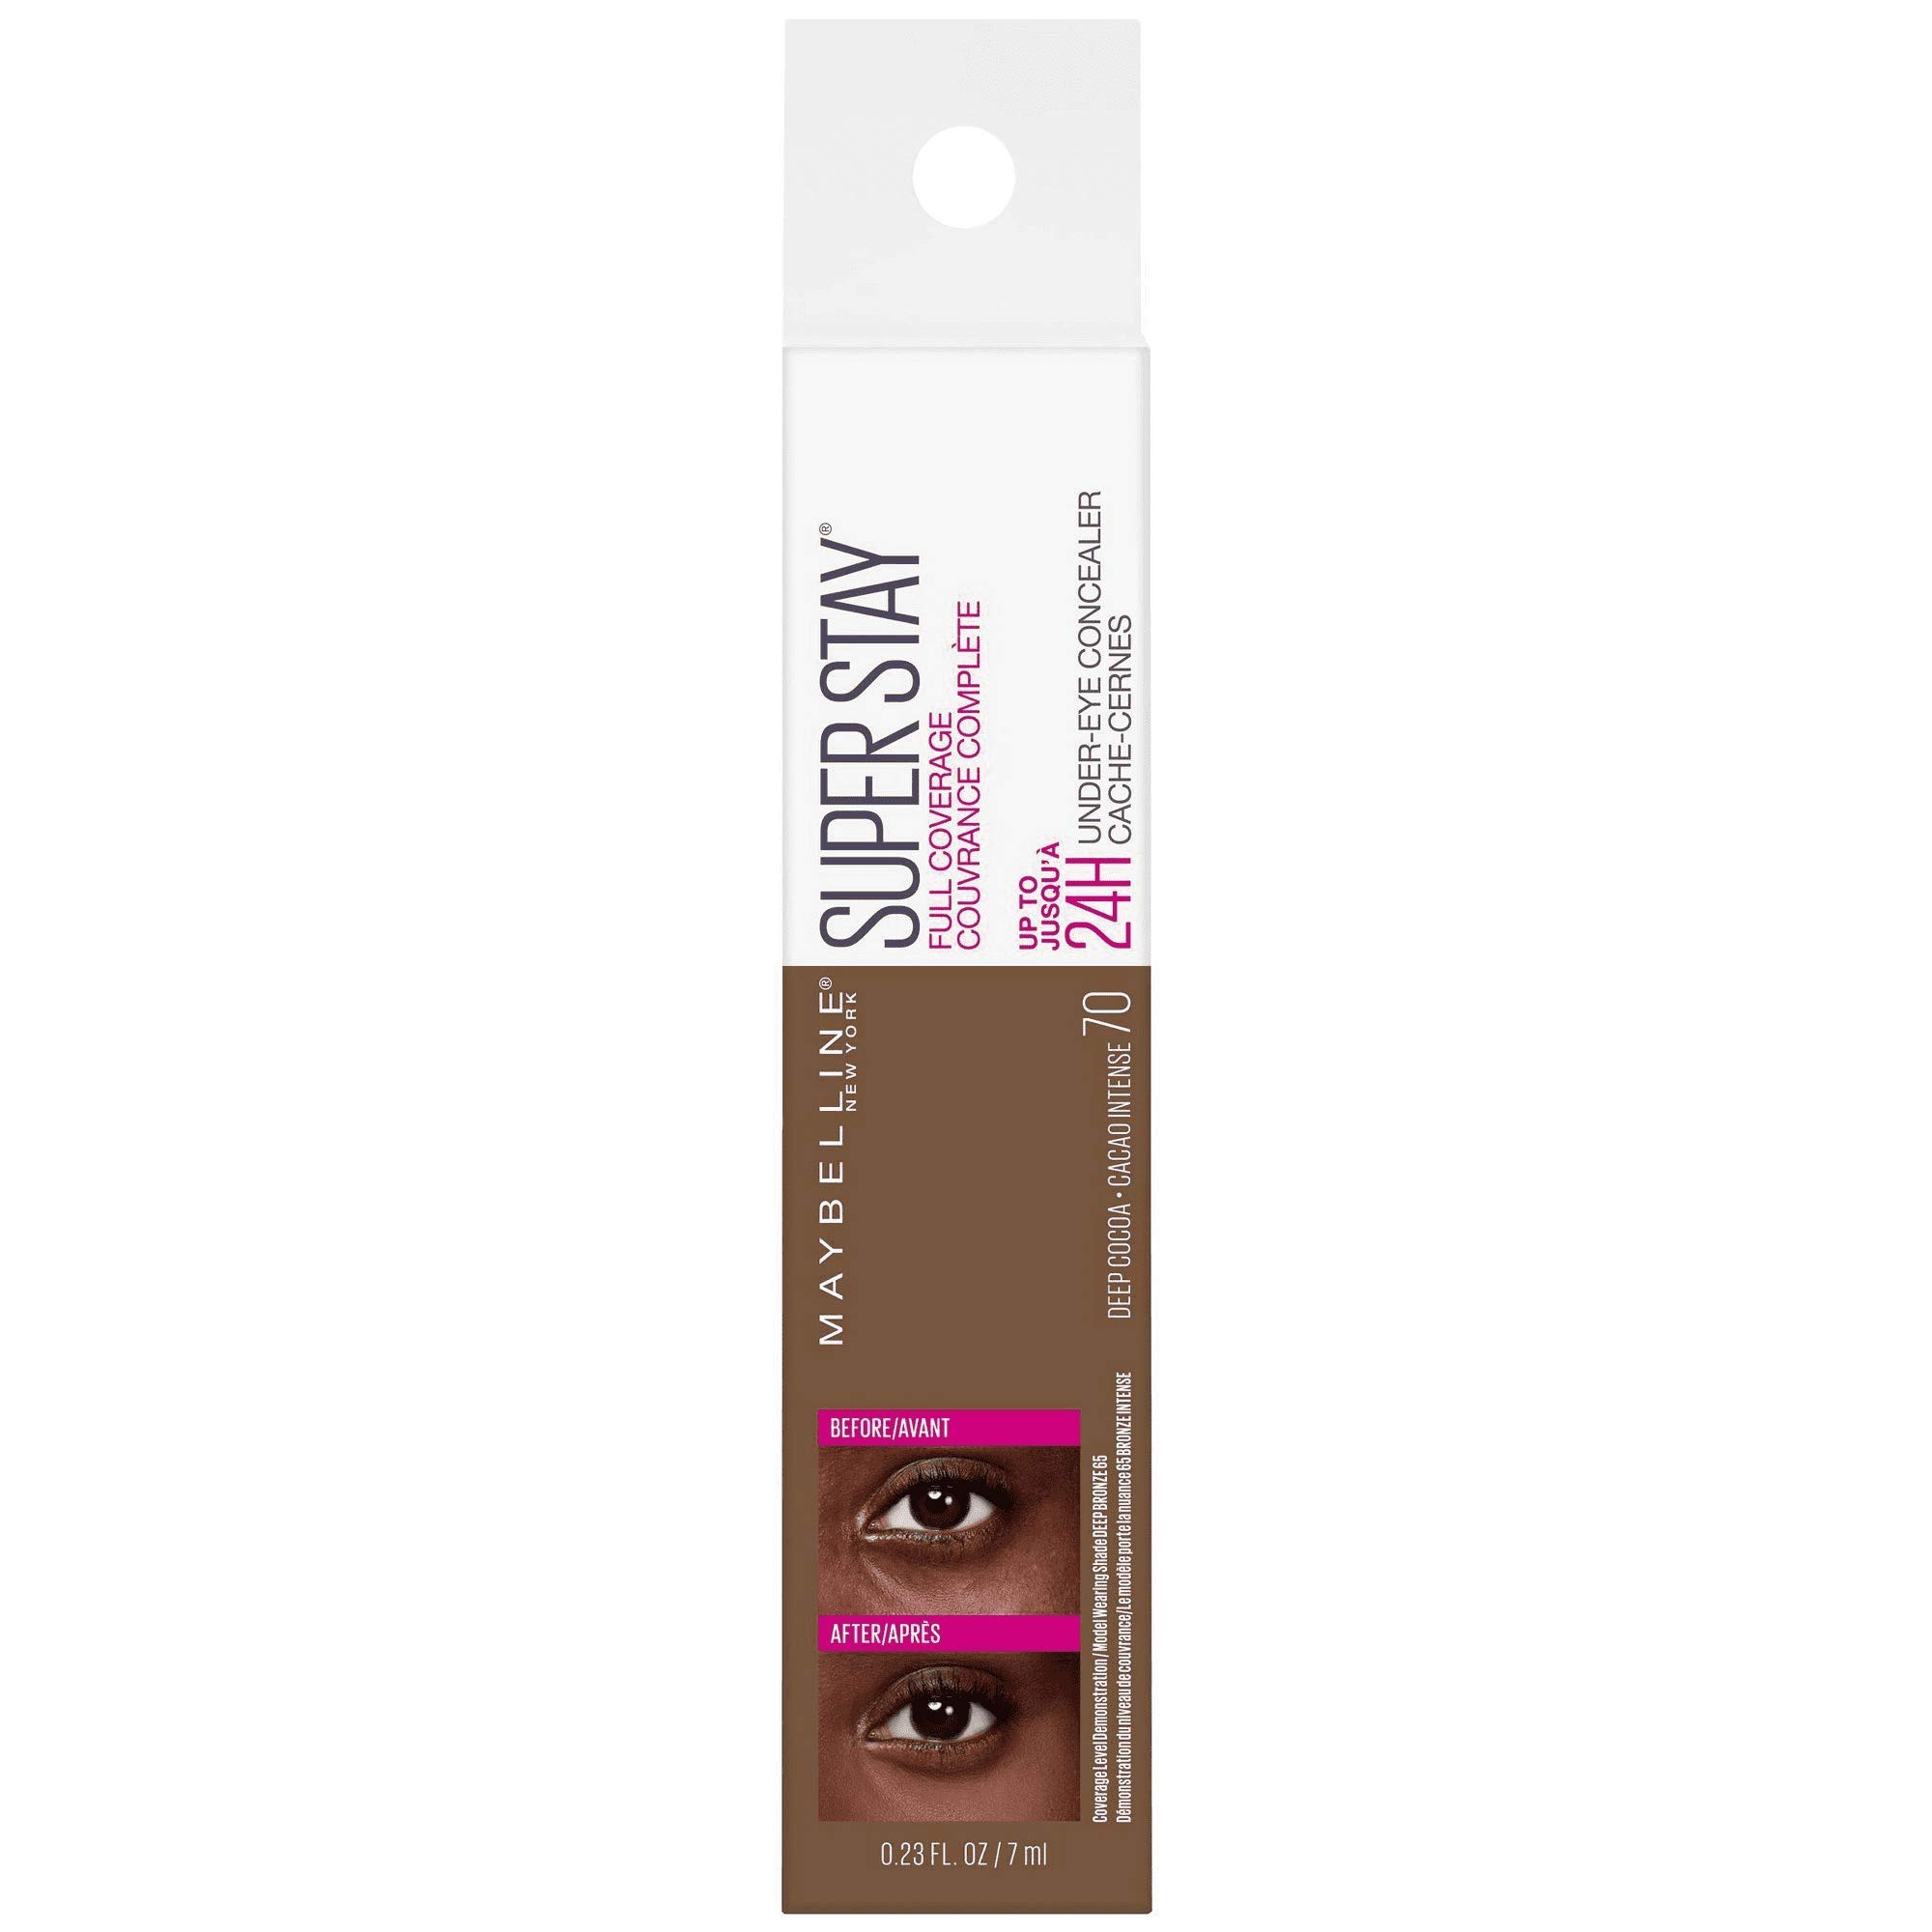 Super Stay Full Coverage Long Lasting Under-Eye Concealer, 70 Deep Cocoa, 0.23 fl oz (Pack of 2)